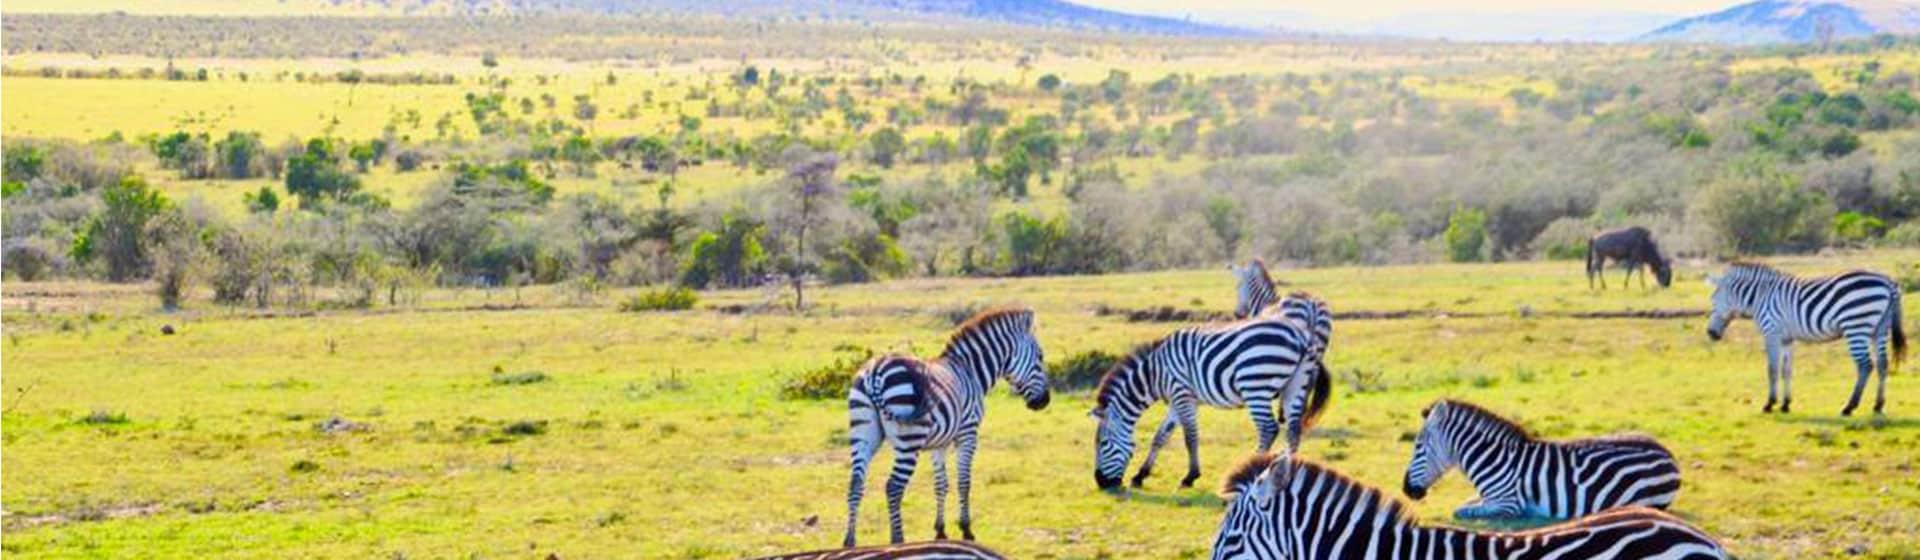 Game drives and activities in Masai Mara